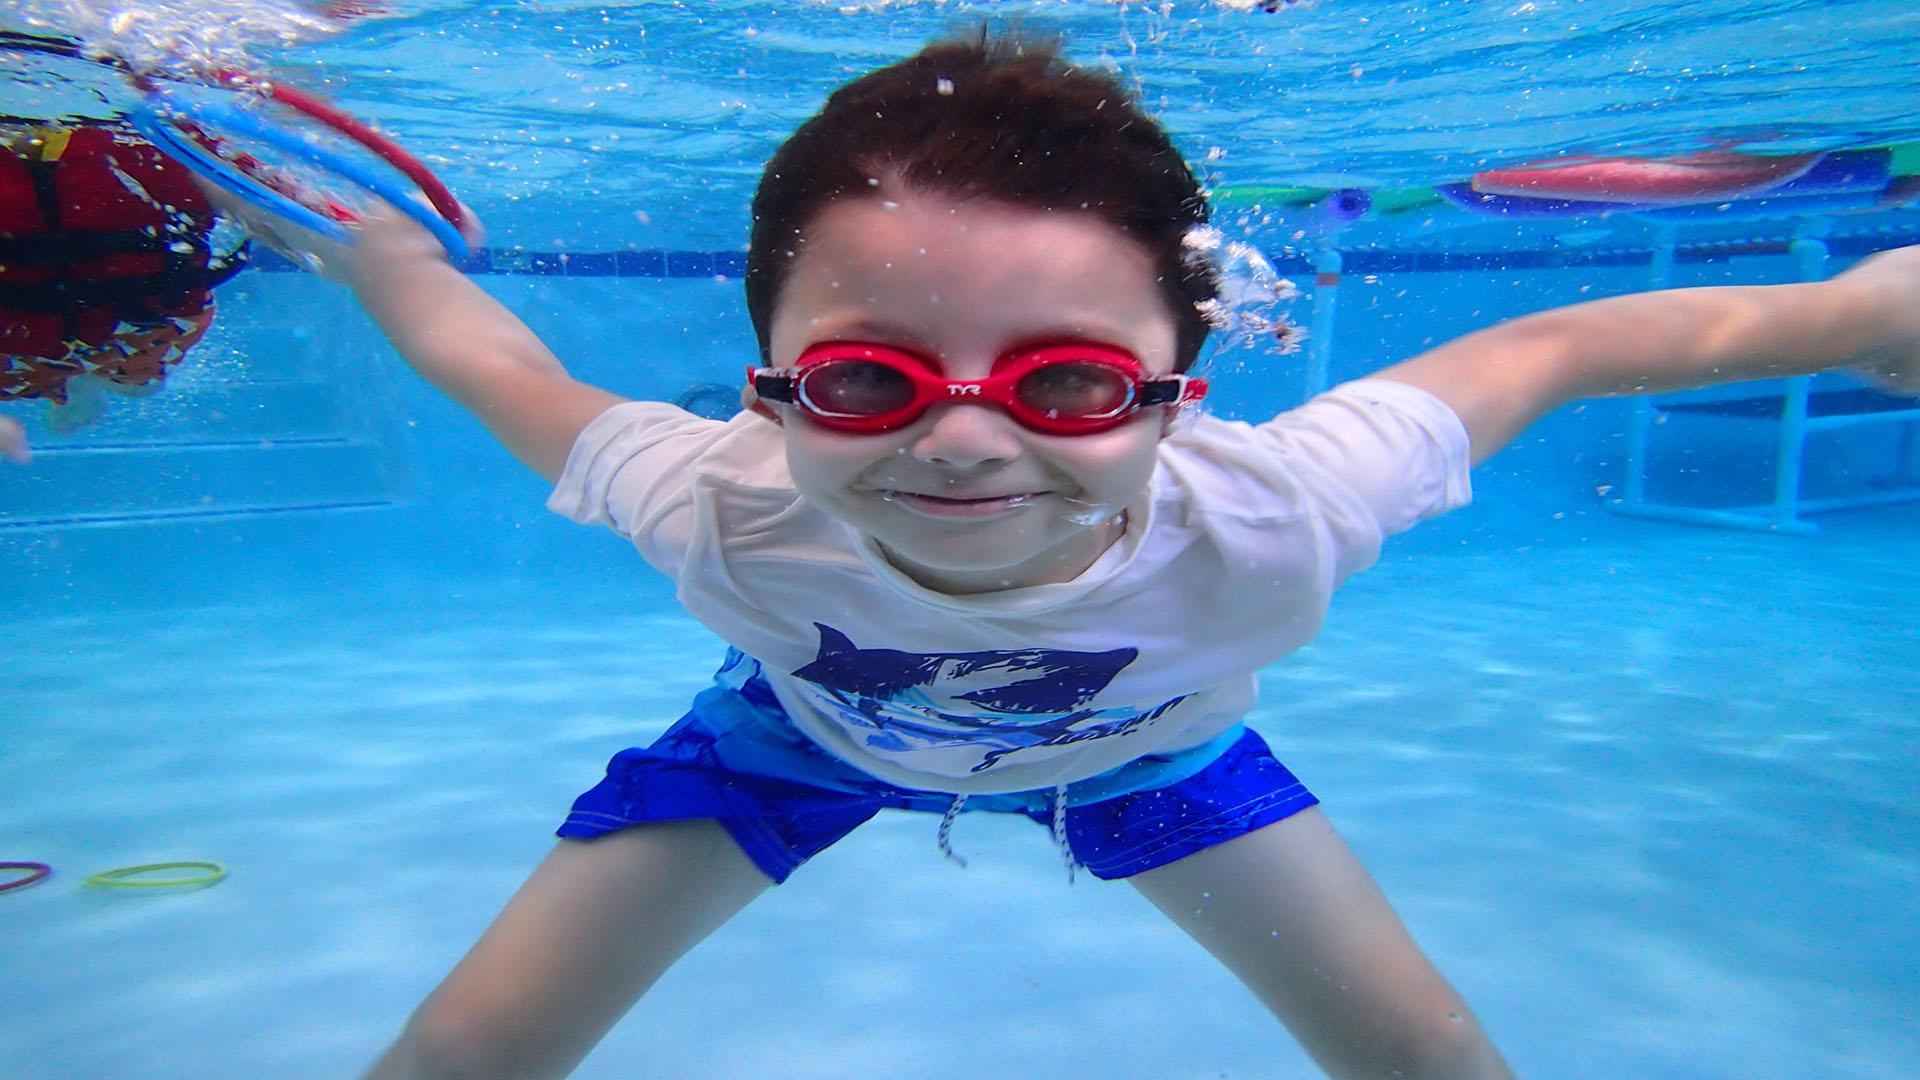 Little Flippers Swim School – A Big Start to Lifelong Safety